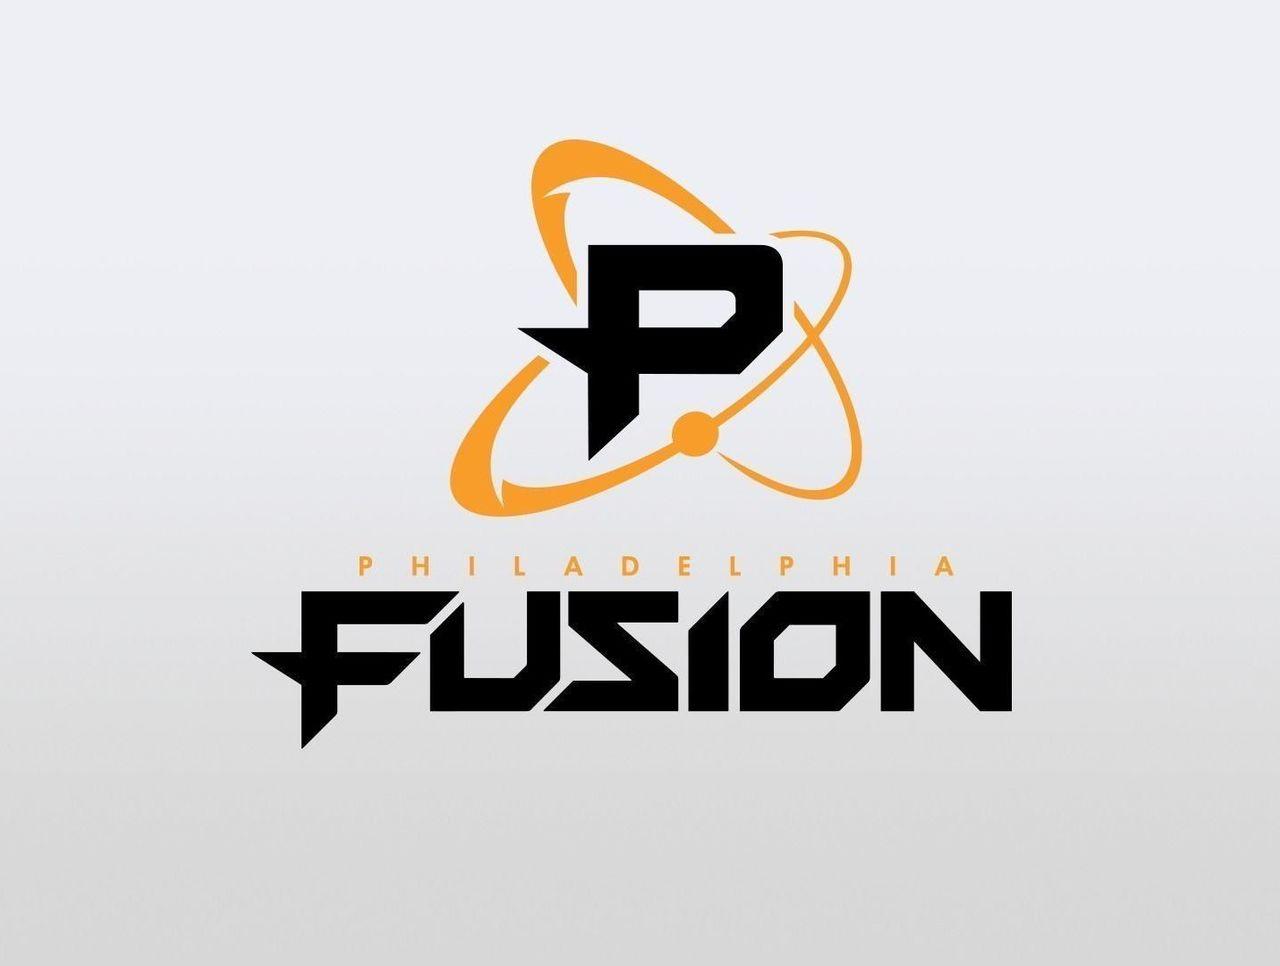 ShaDowBurn, Carpe headline Philadelphia Fusion's international roster